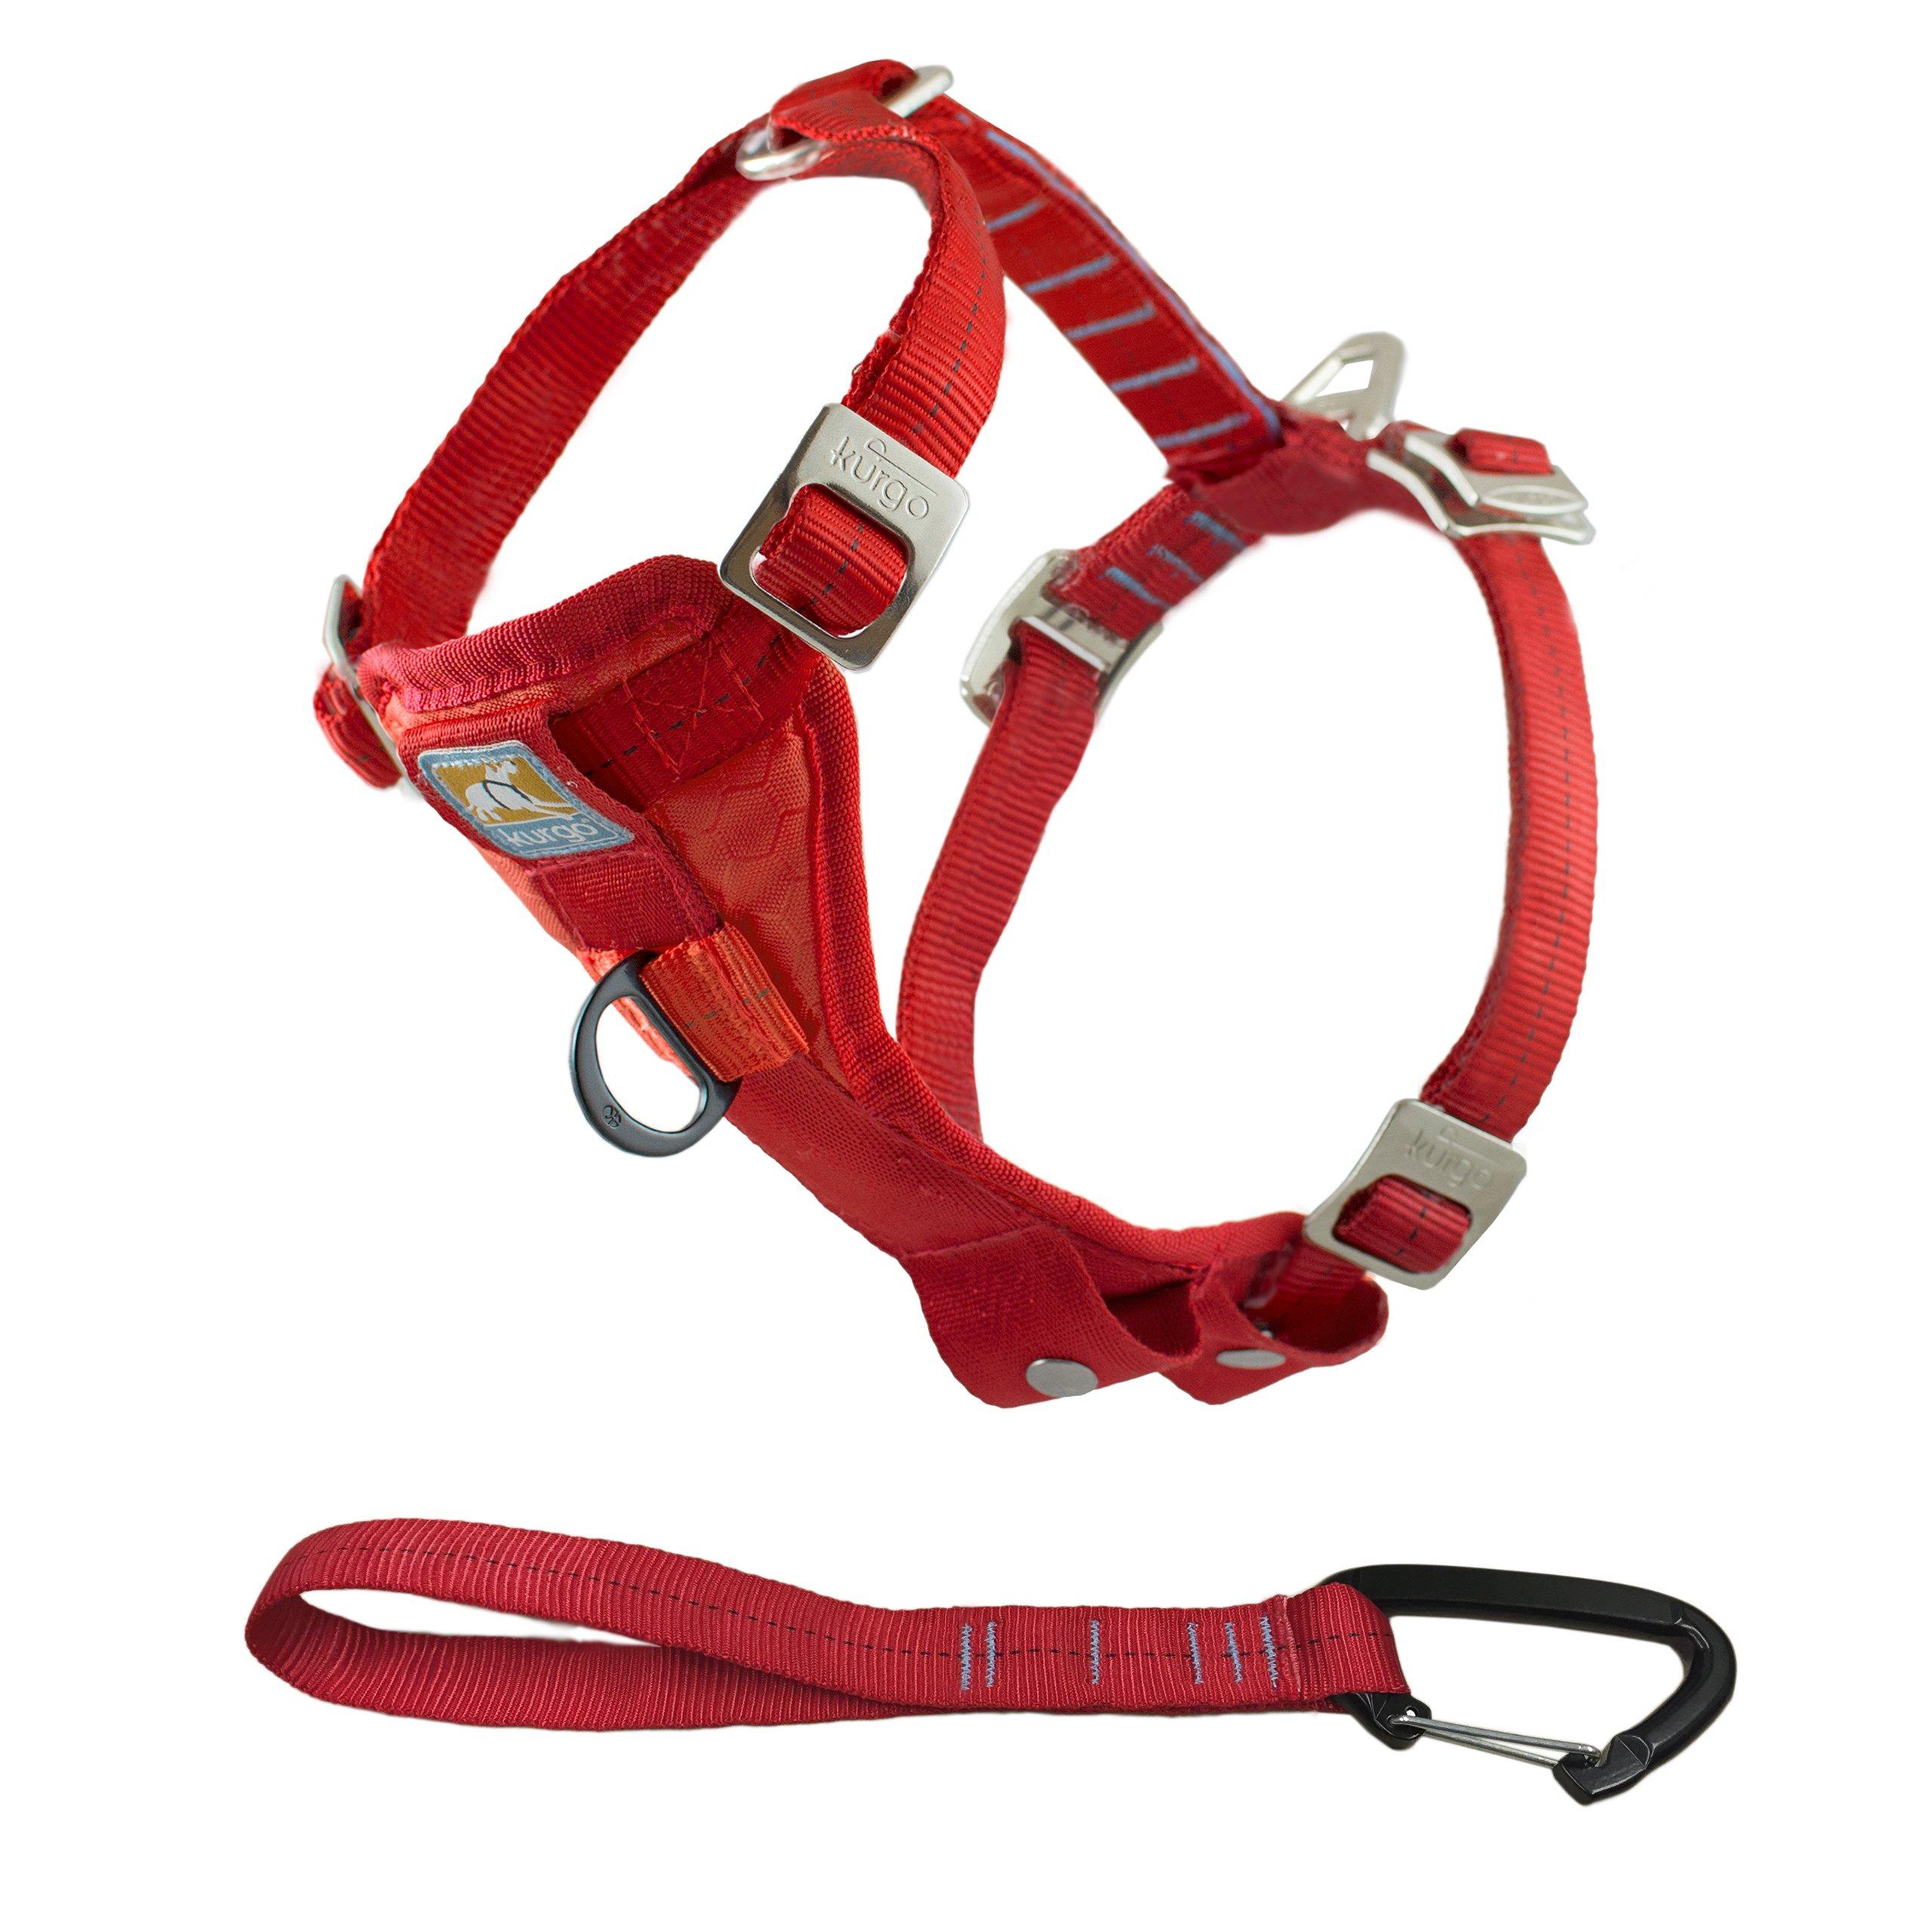 Kurgo Tru-Fit(TM) Crash Tested Dog Harness, Red, Medium